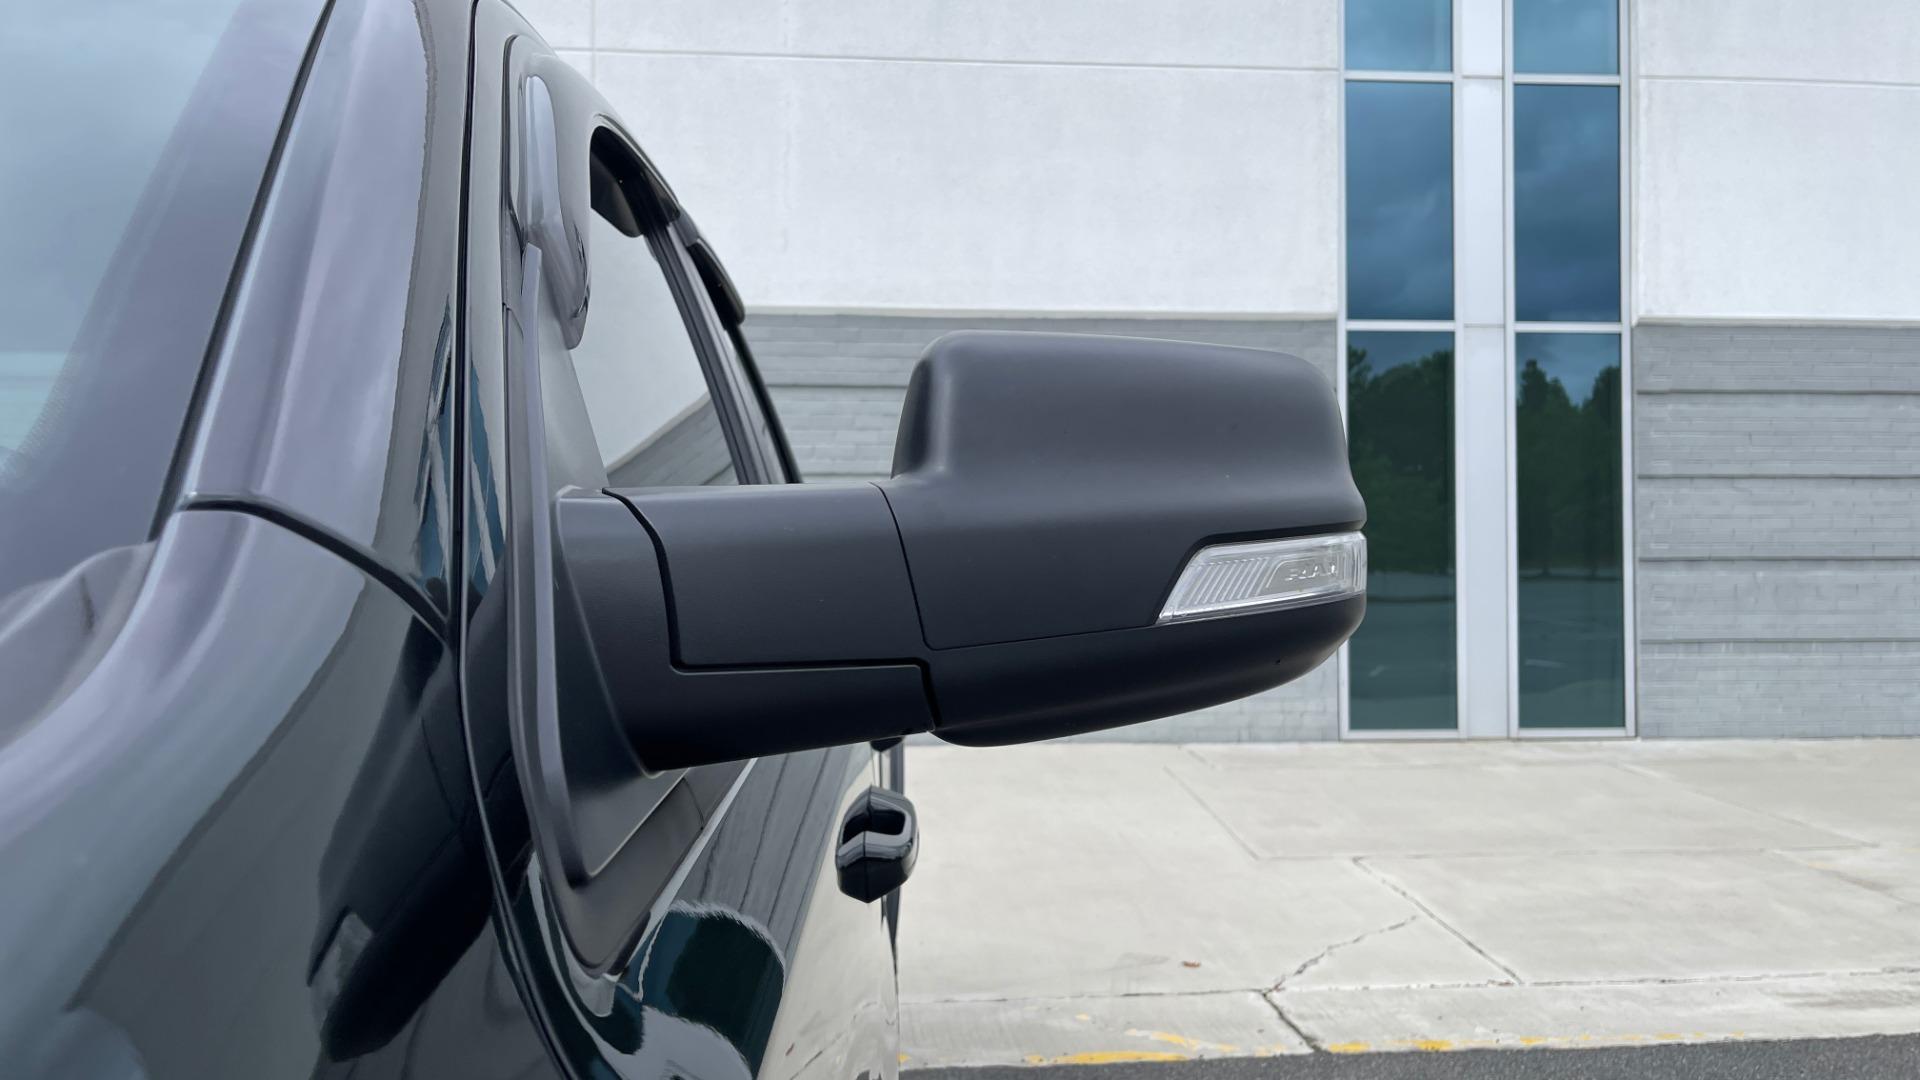 Used 2019 Ram 1500 REBEL QUADCAB 4X4 / 5.7L HEMI / 8-SPD AUTO / REMOTE START / PARK ASSIST for sale $44,495 at Formula Imports in Charlotte NC 28227 14